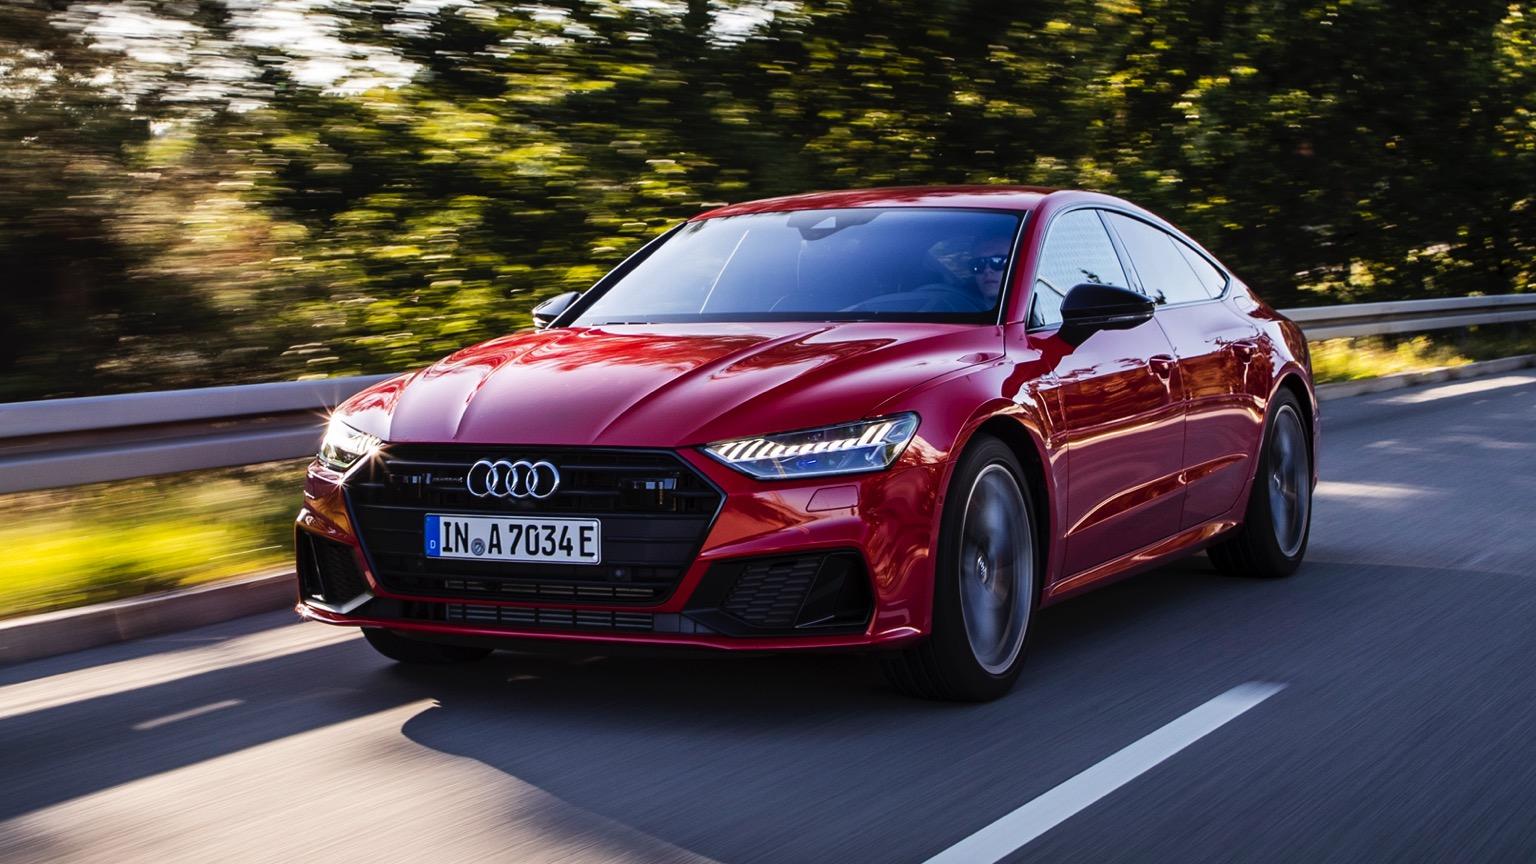 Audi A7 Sportback 55 TFSI e quattro (2021)